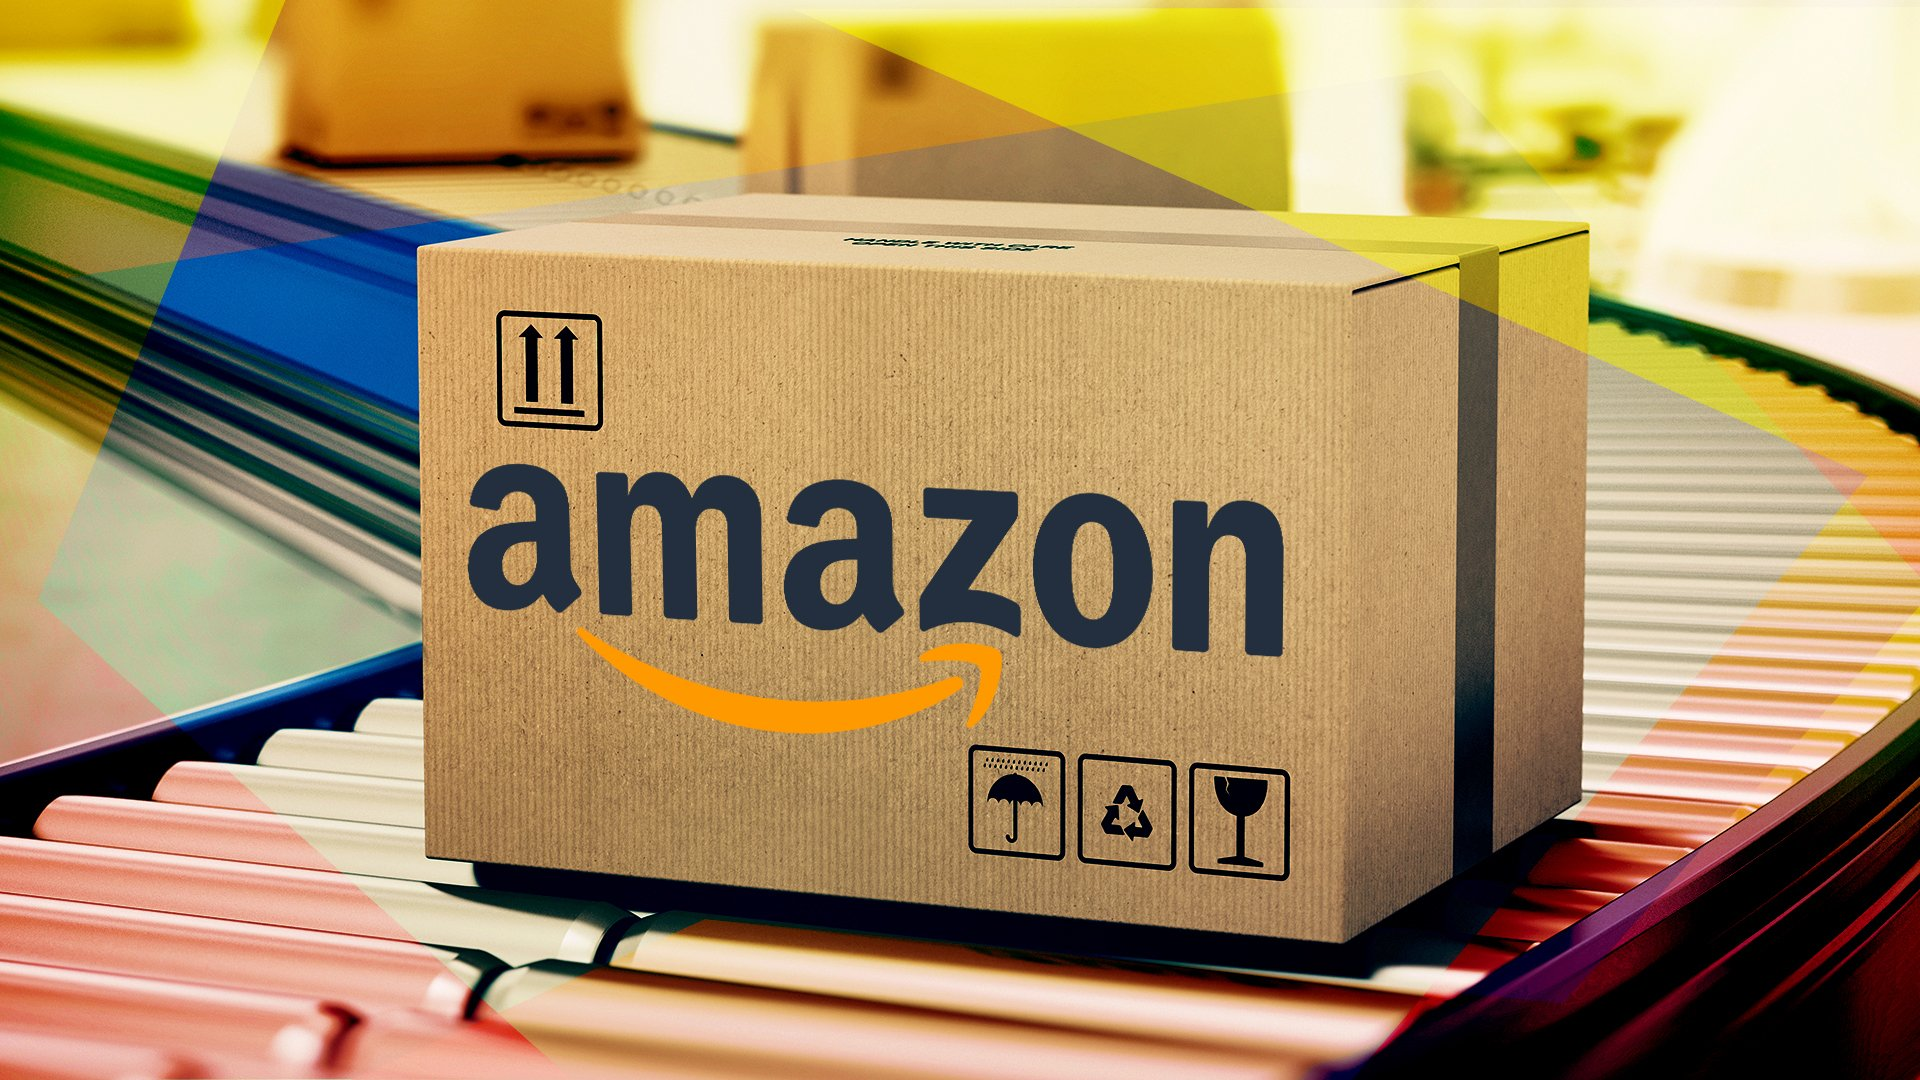 DSGVO-Bußgeld: EU verhängt 746 Mio. Euro Rekordstrafe gegen Amazon